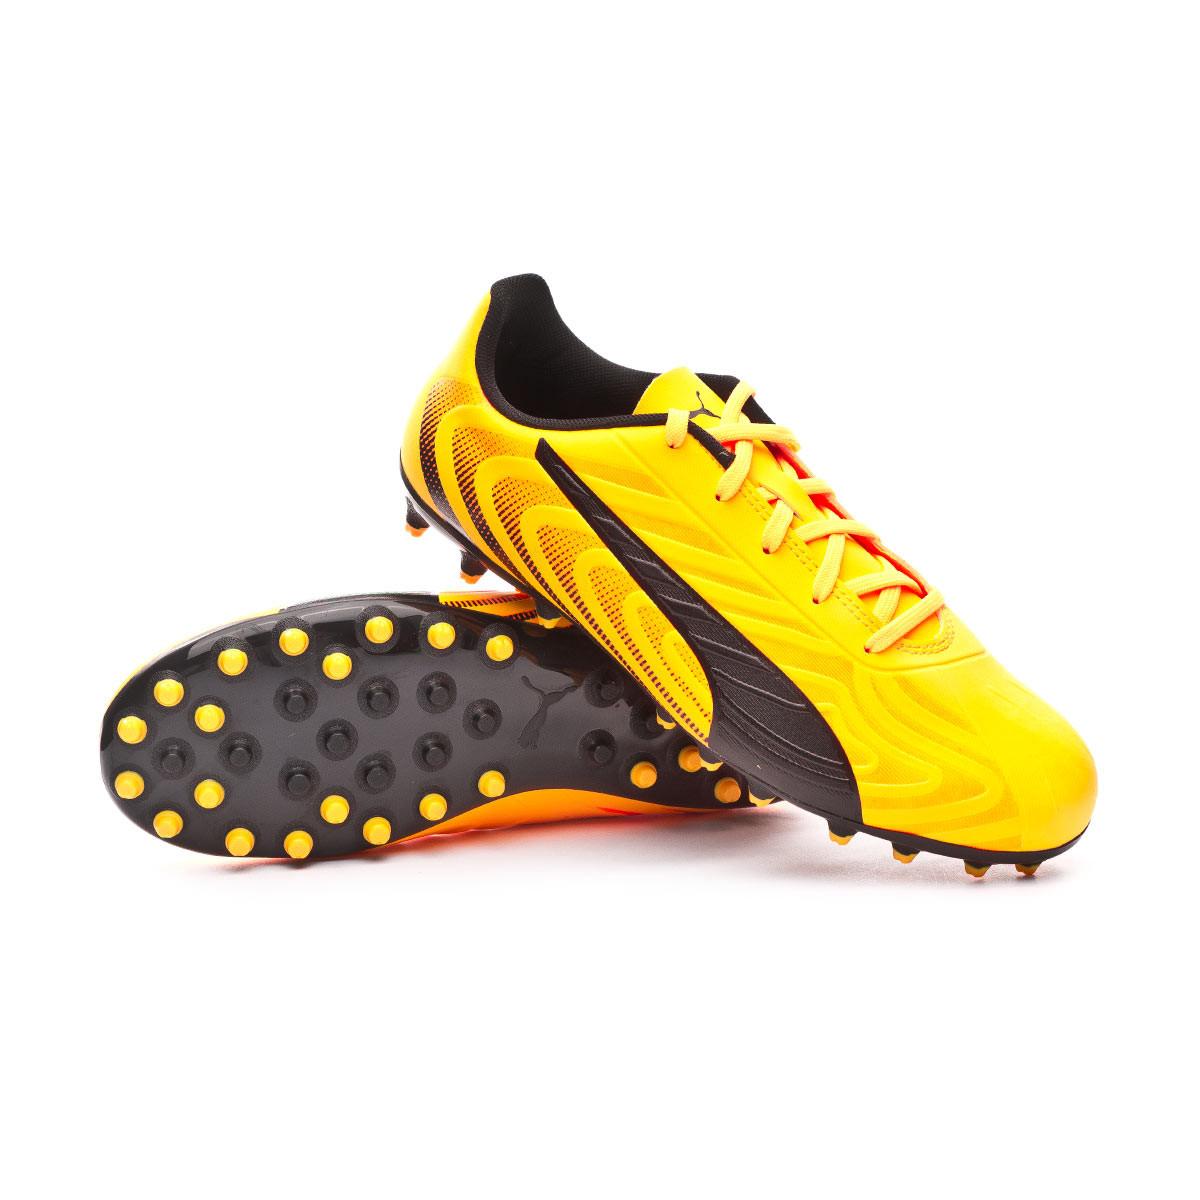 Puma One 20.4 MG Niño Football Boots